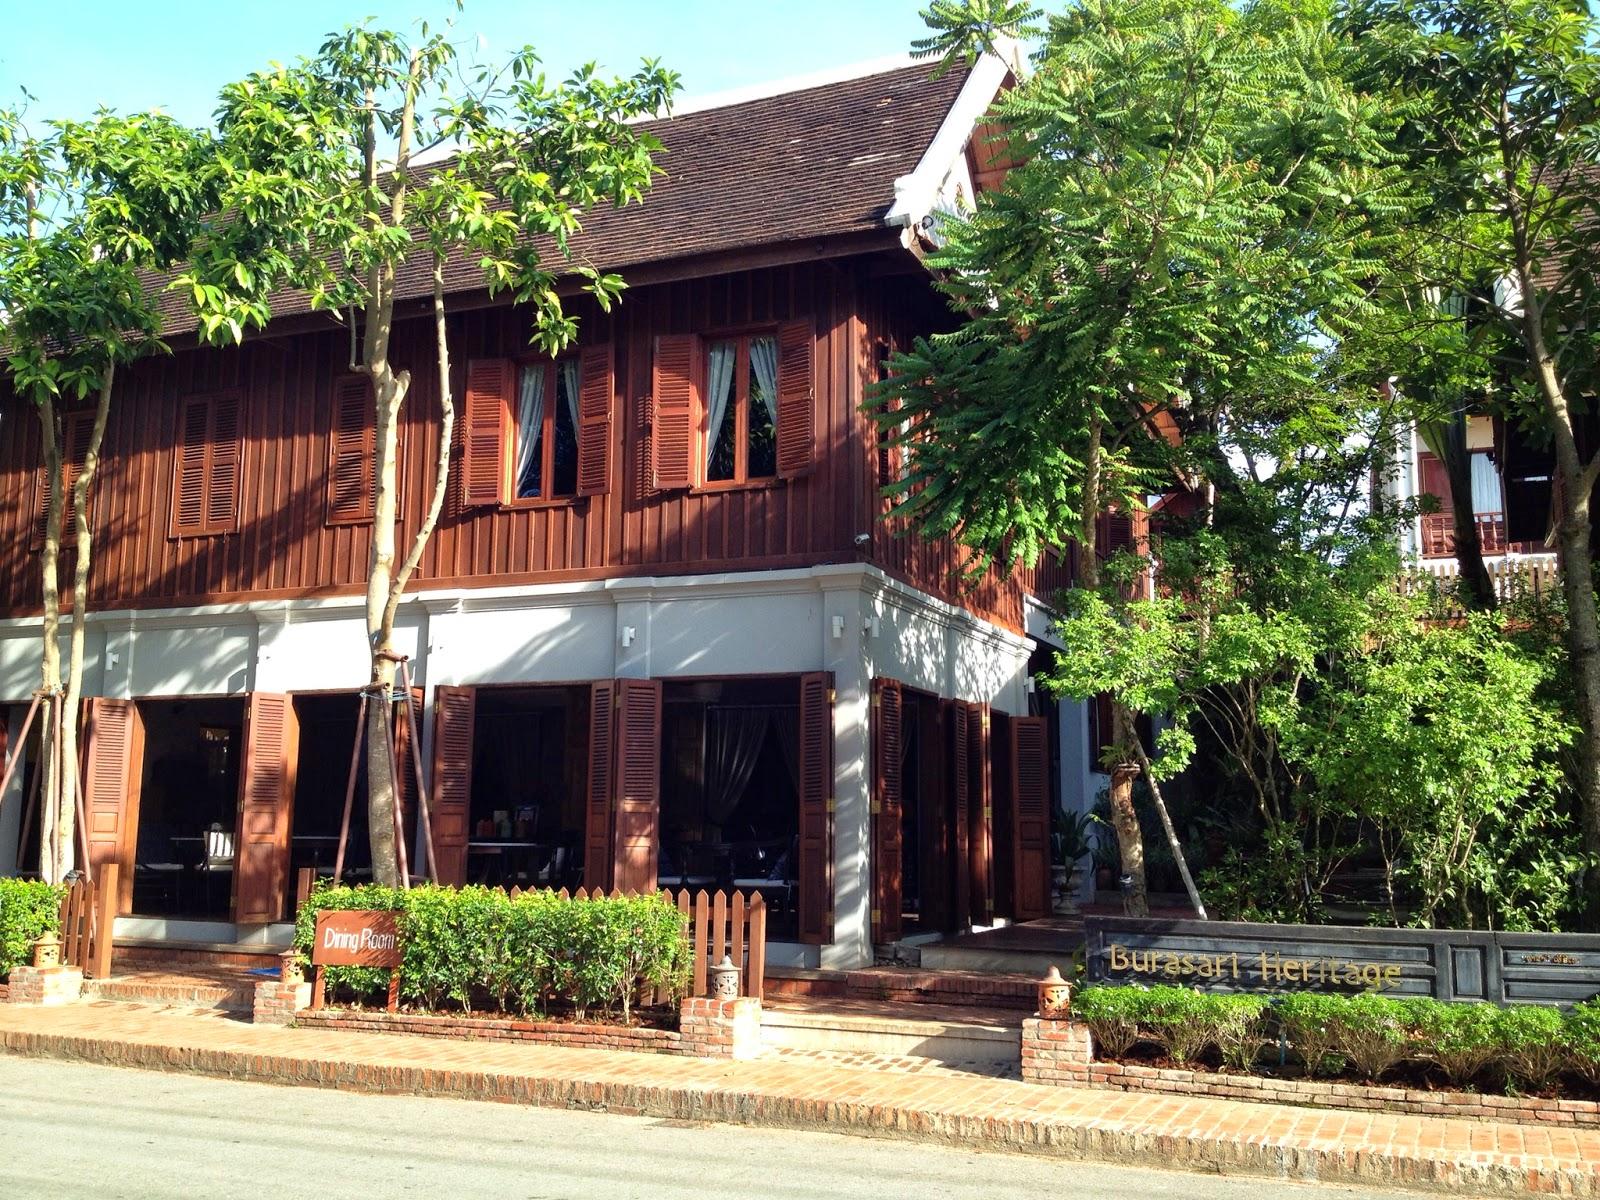 Luang Prabang - Burasari Heritage exterior